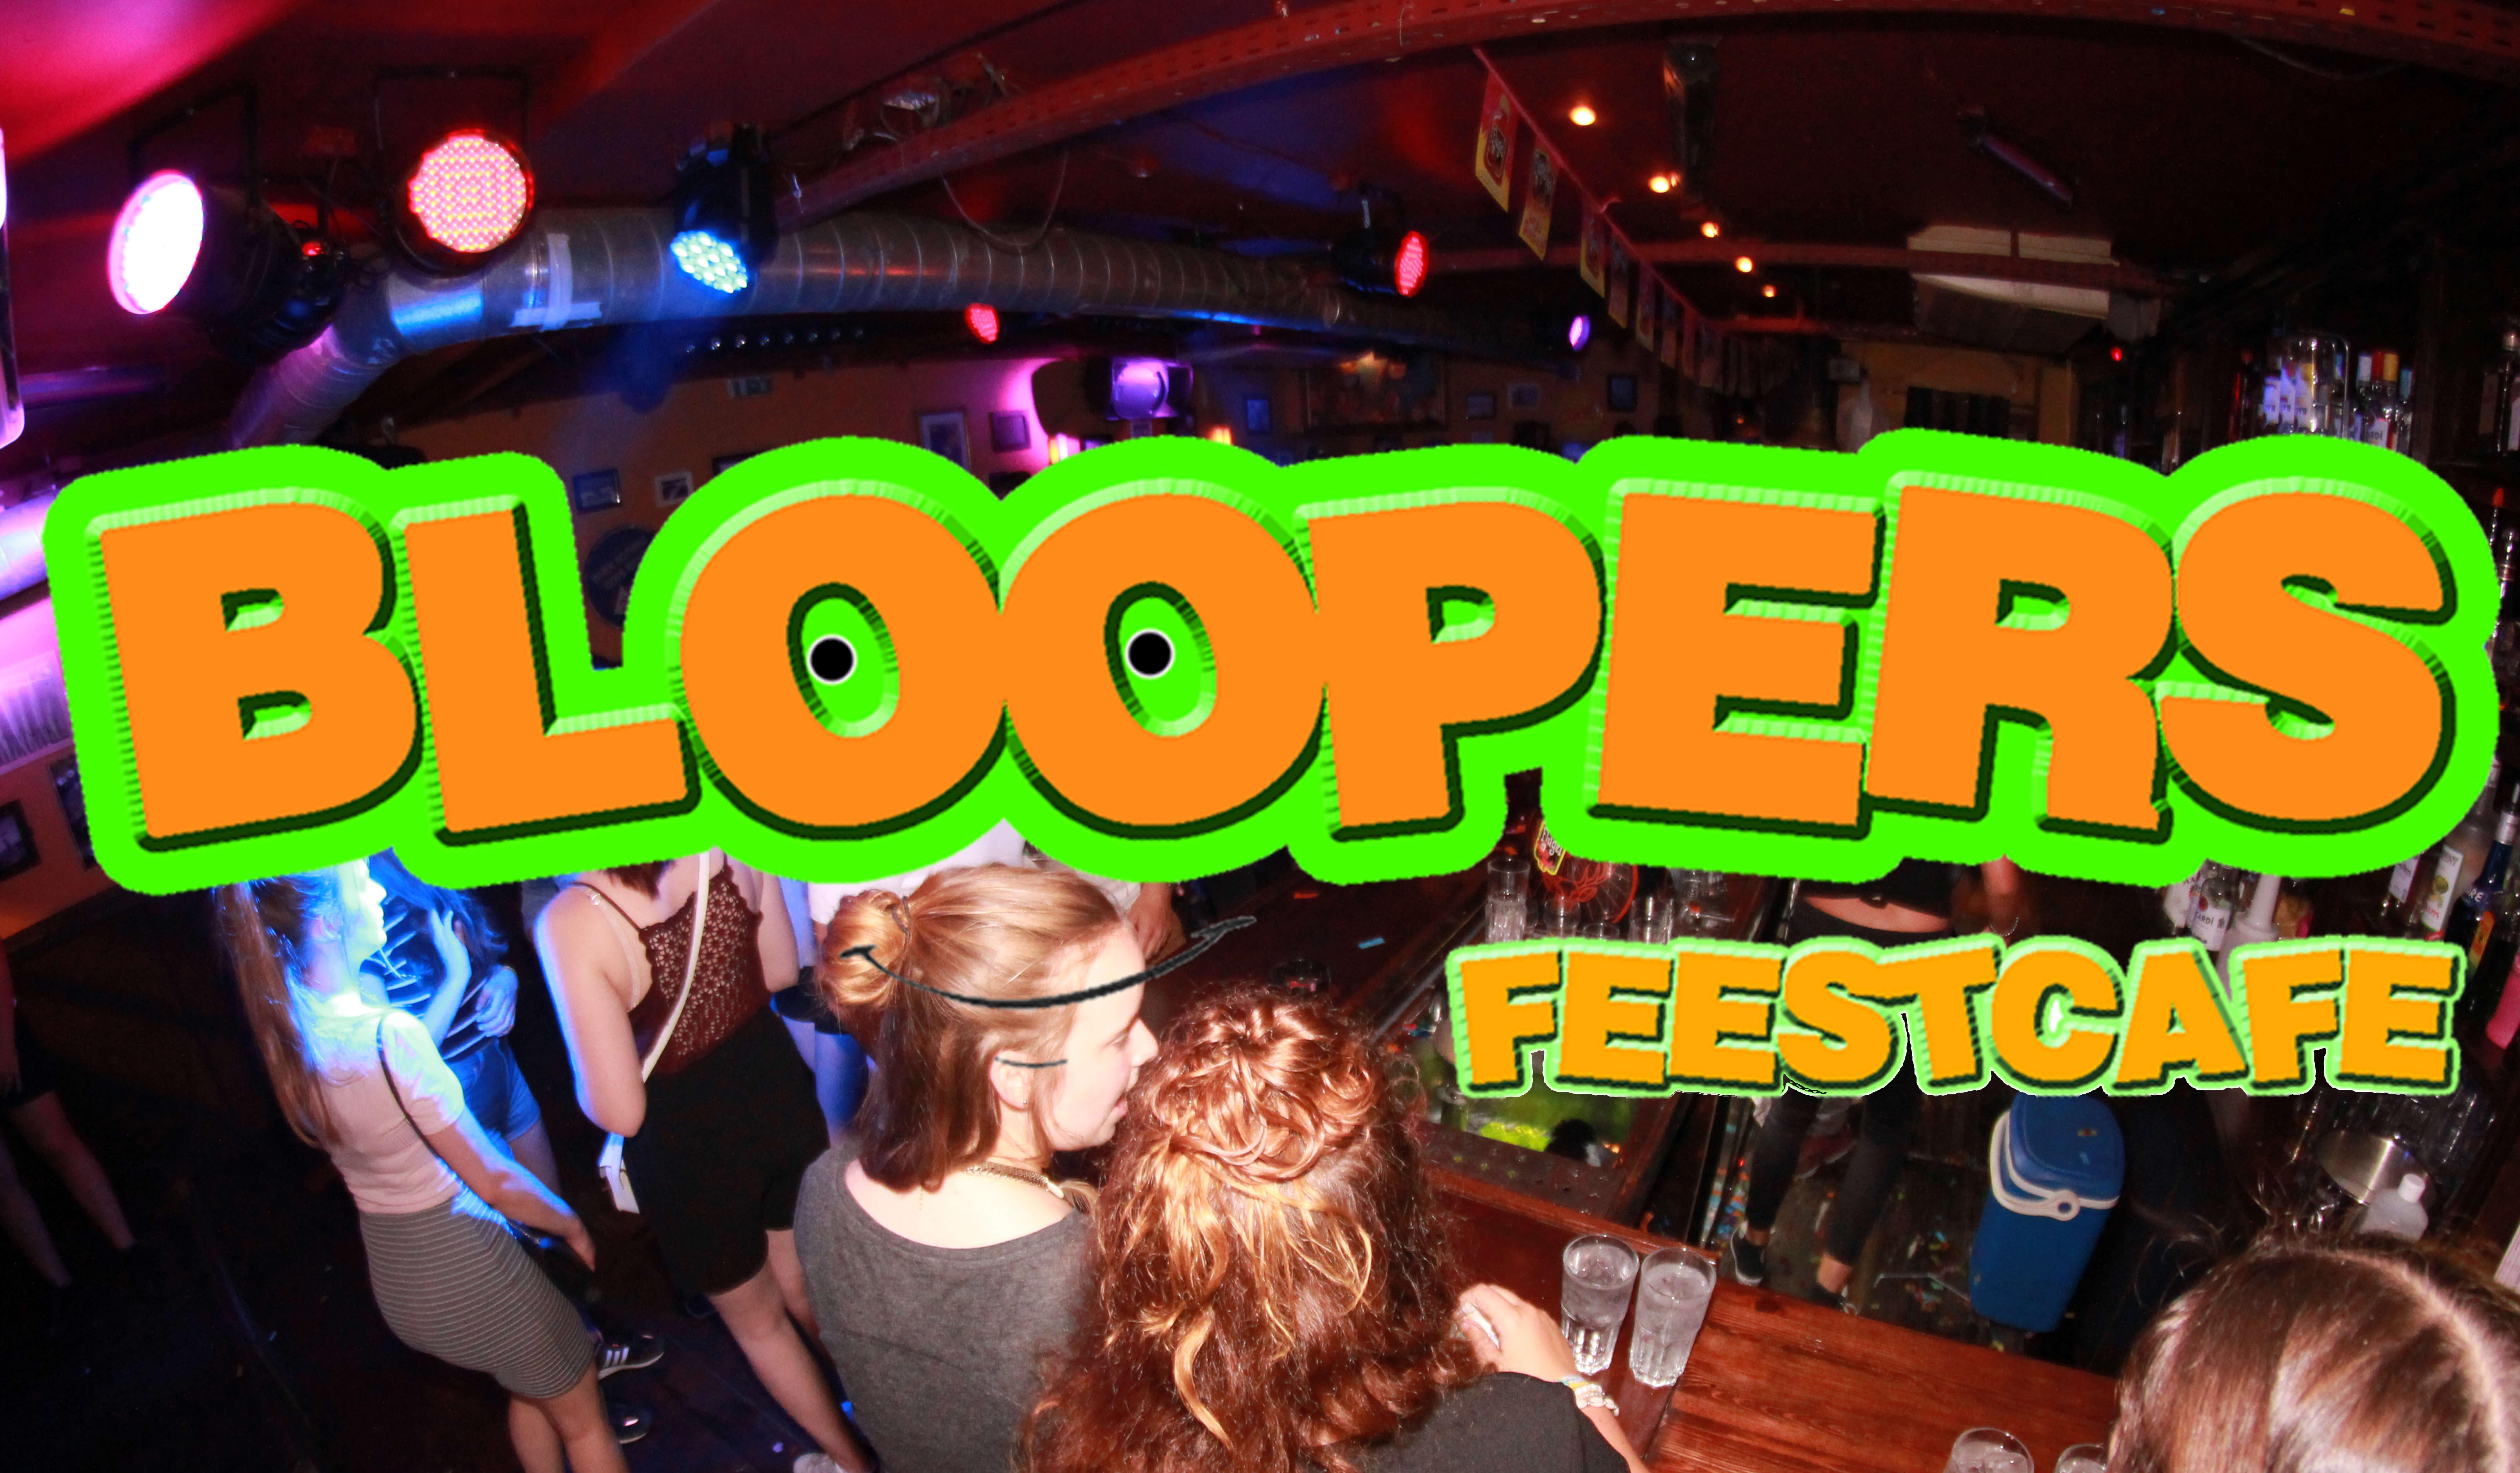 Bloopers-stappeninalbufeira